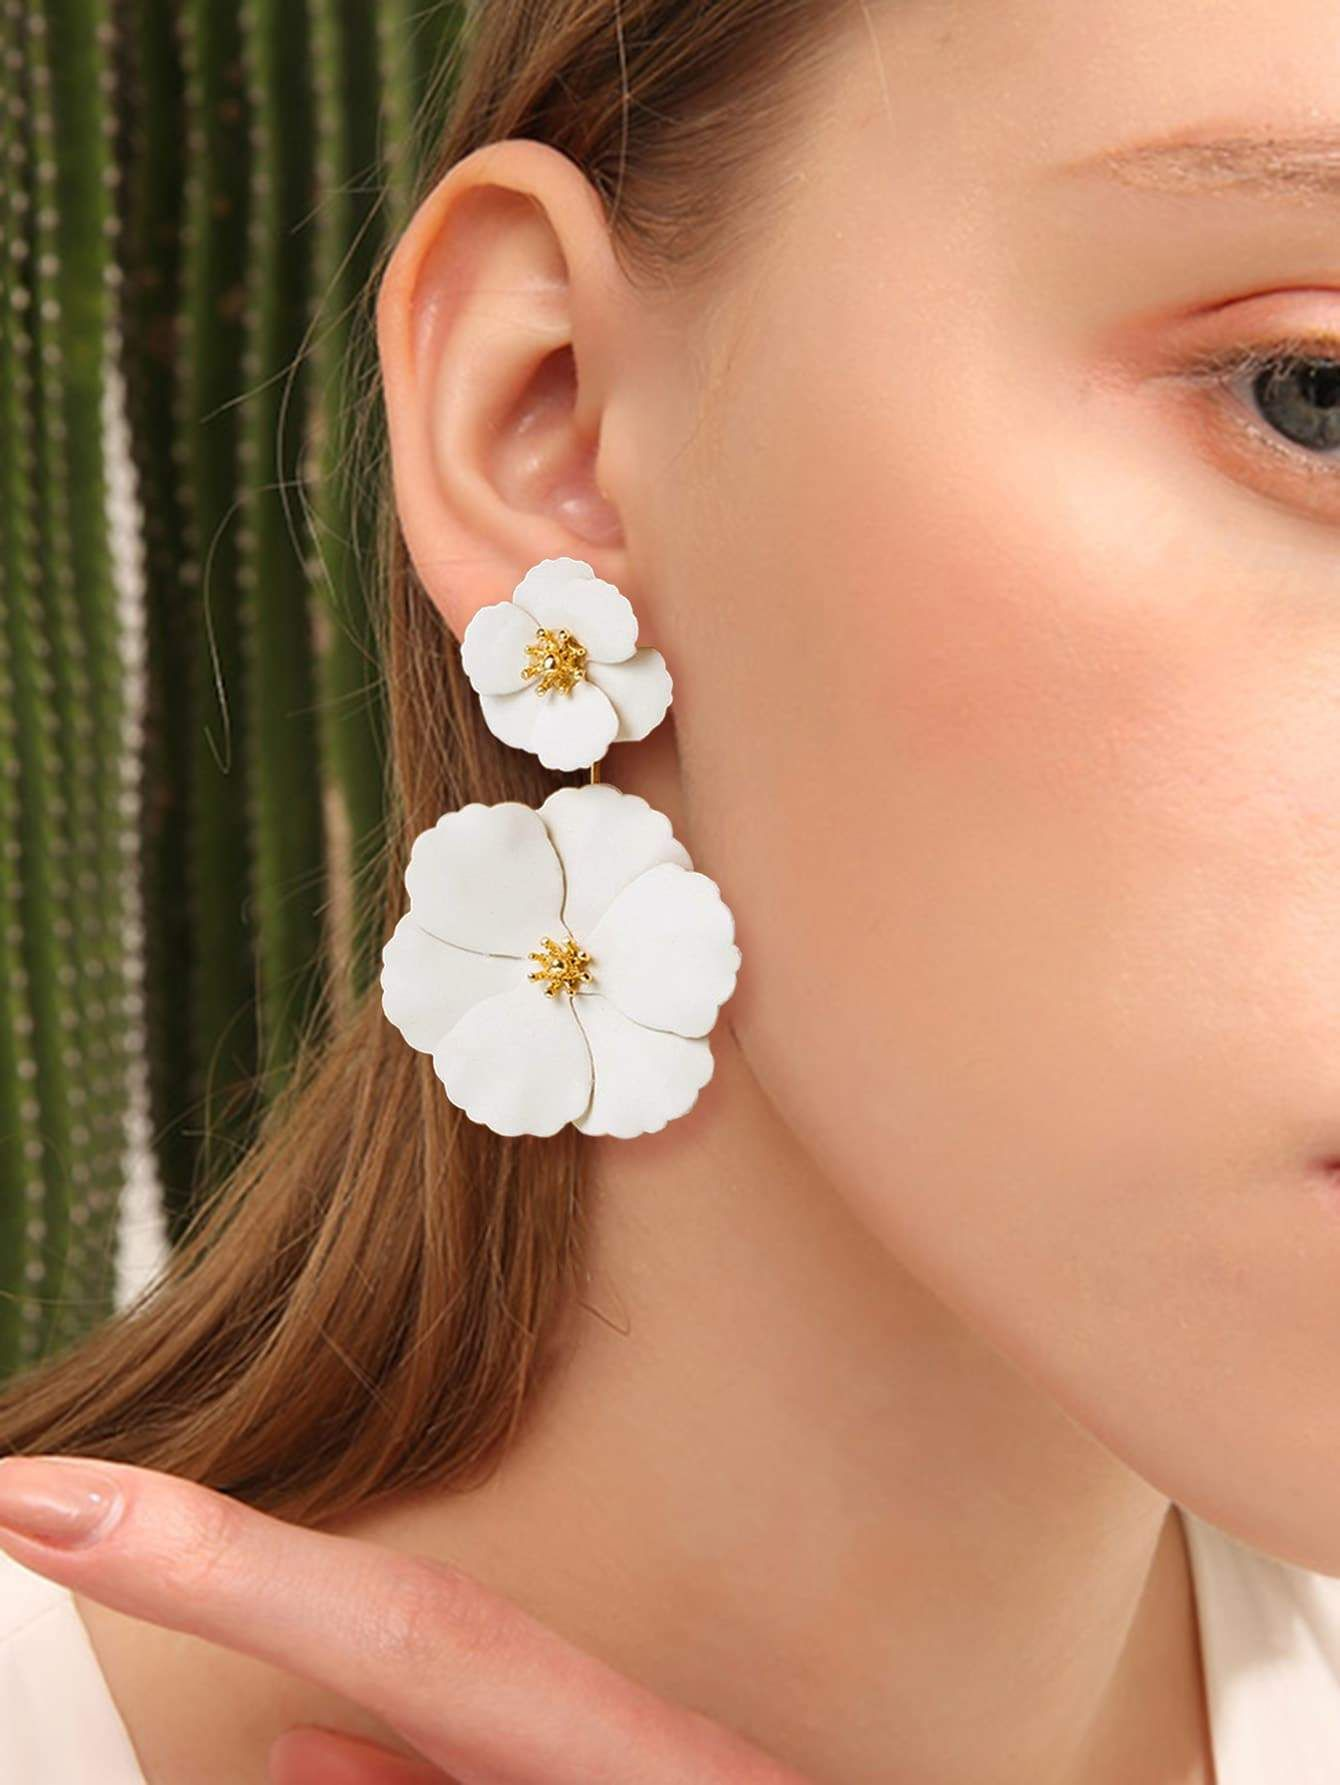 Pink Resin and Rhinestone Retro Style Flower Drop Earrings